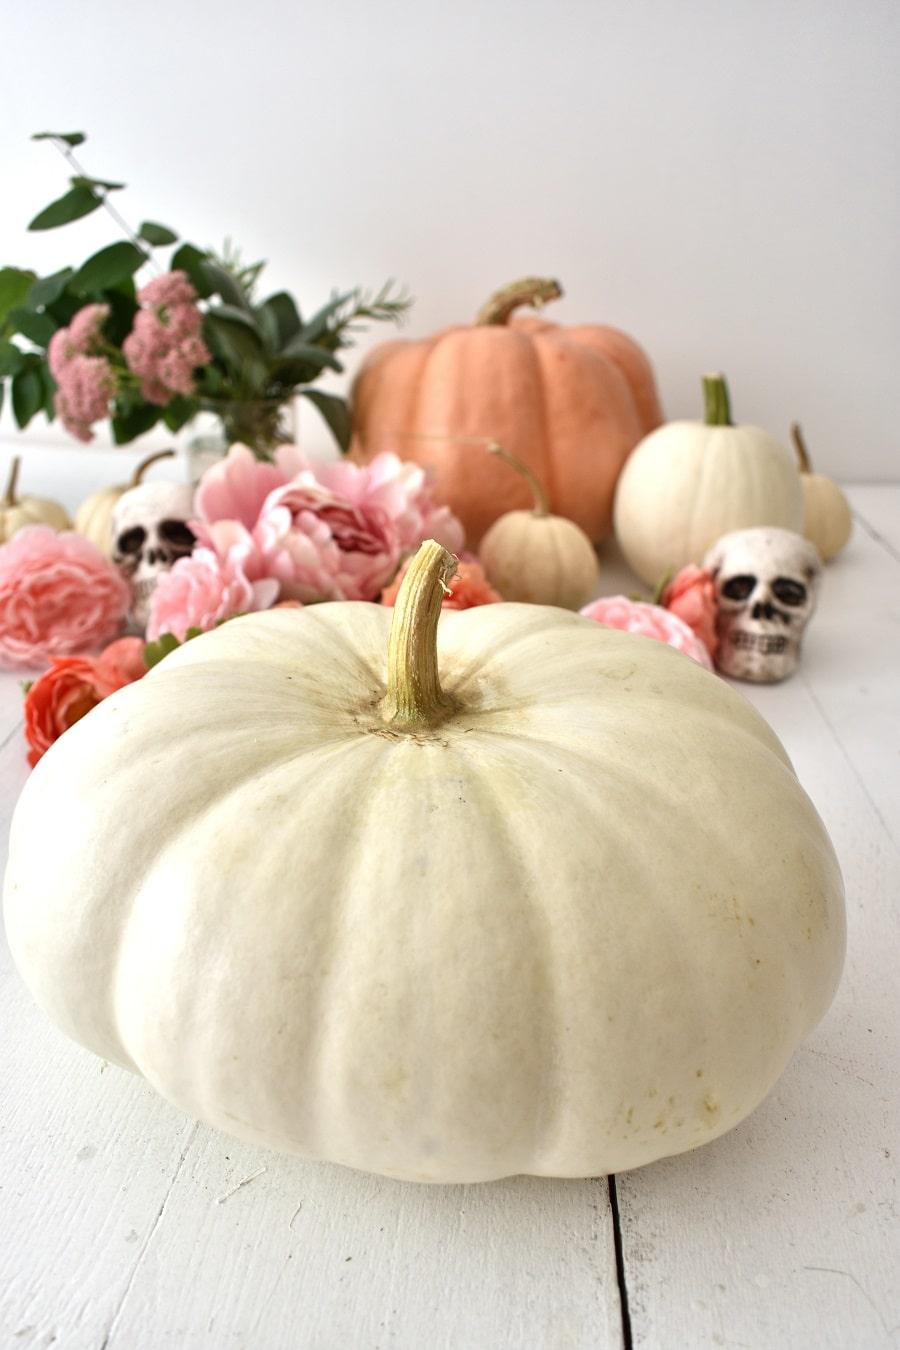 Boos & Blooms Halloween Centerpiece